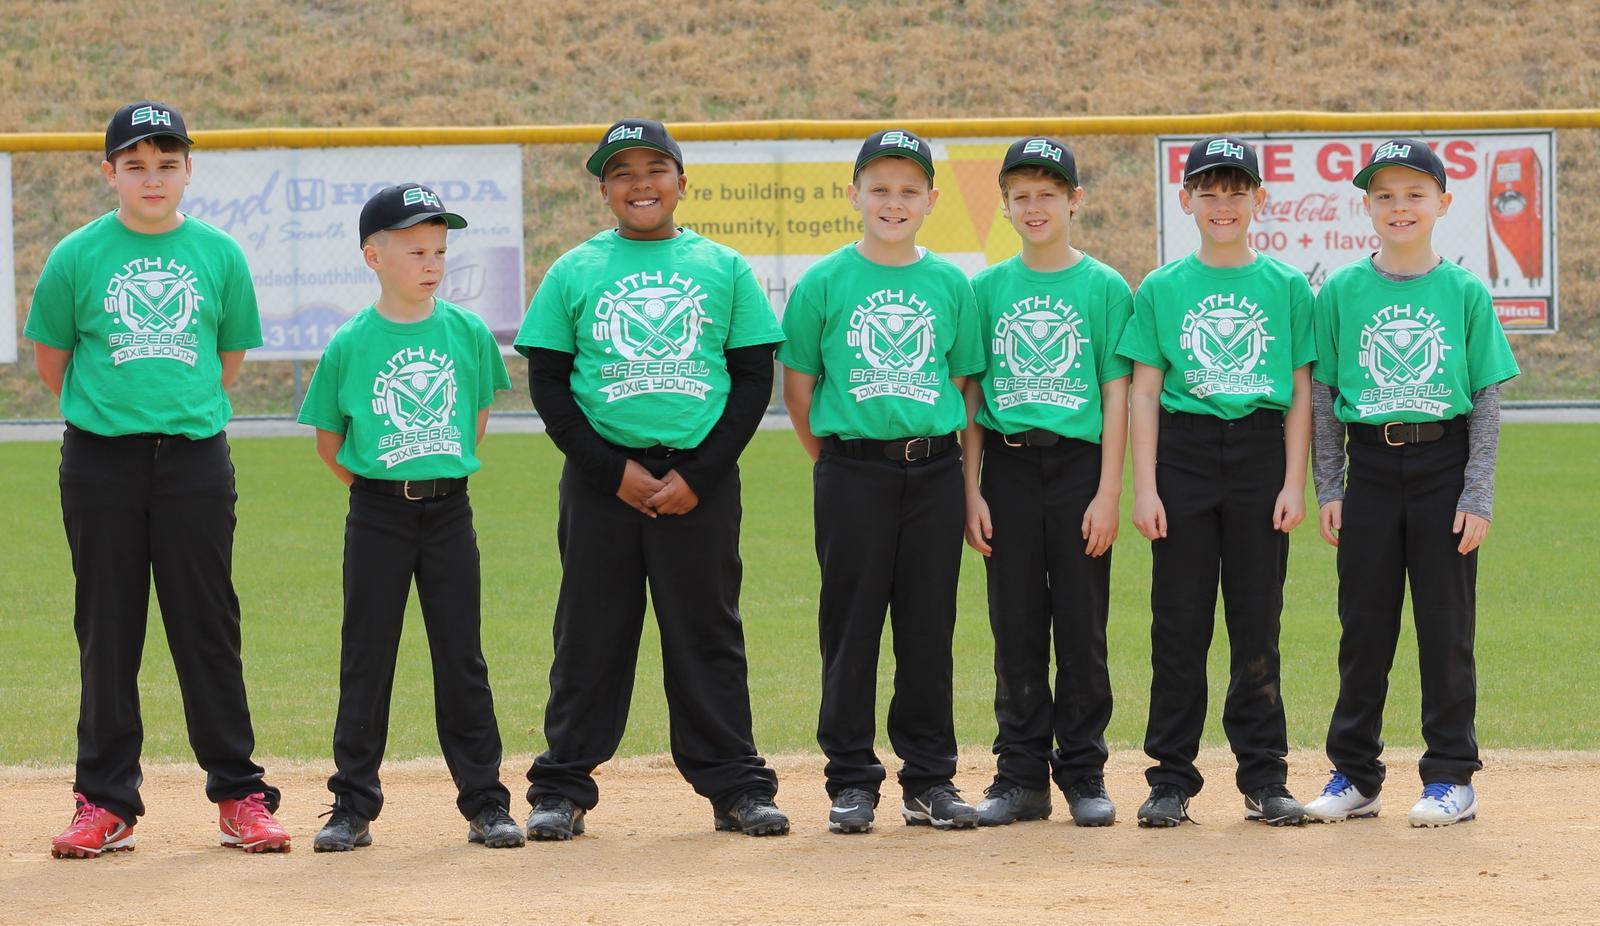 South Hill Baseball